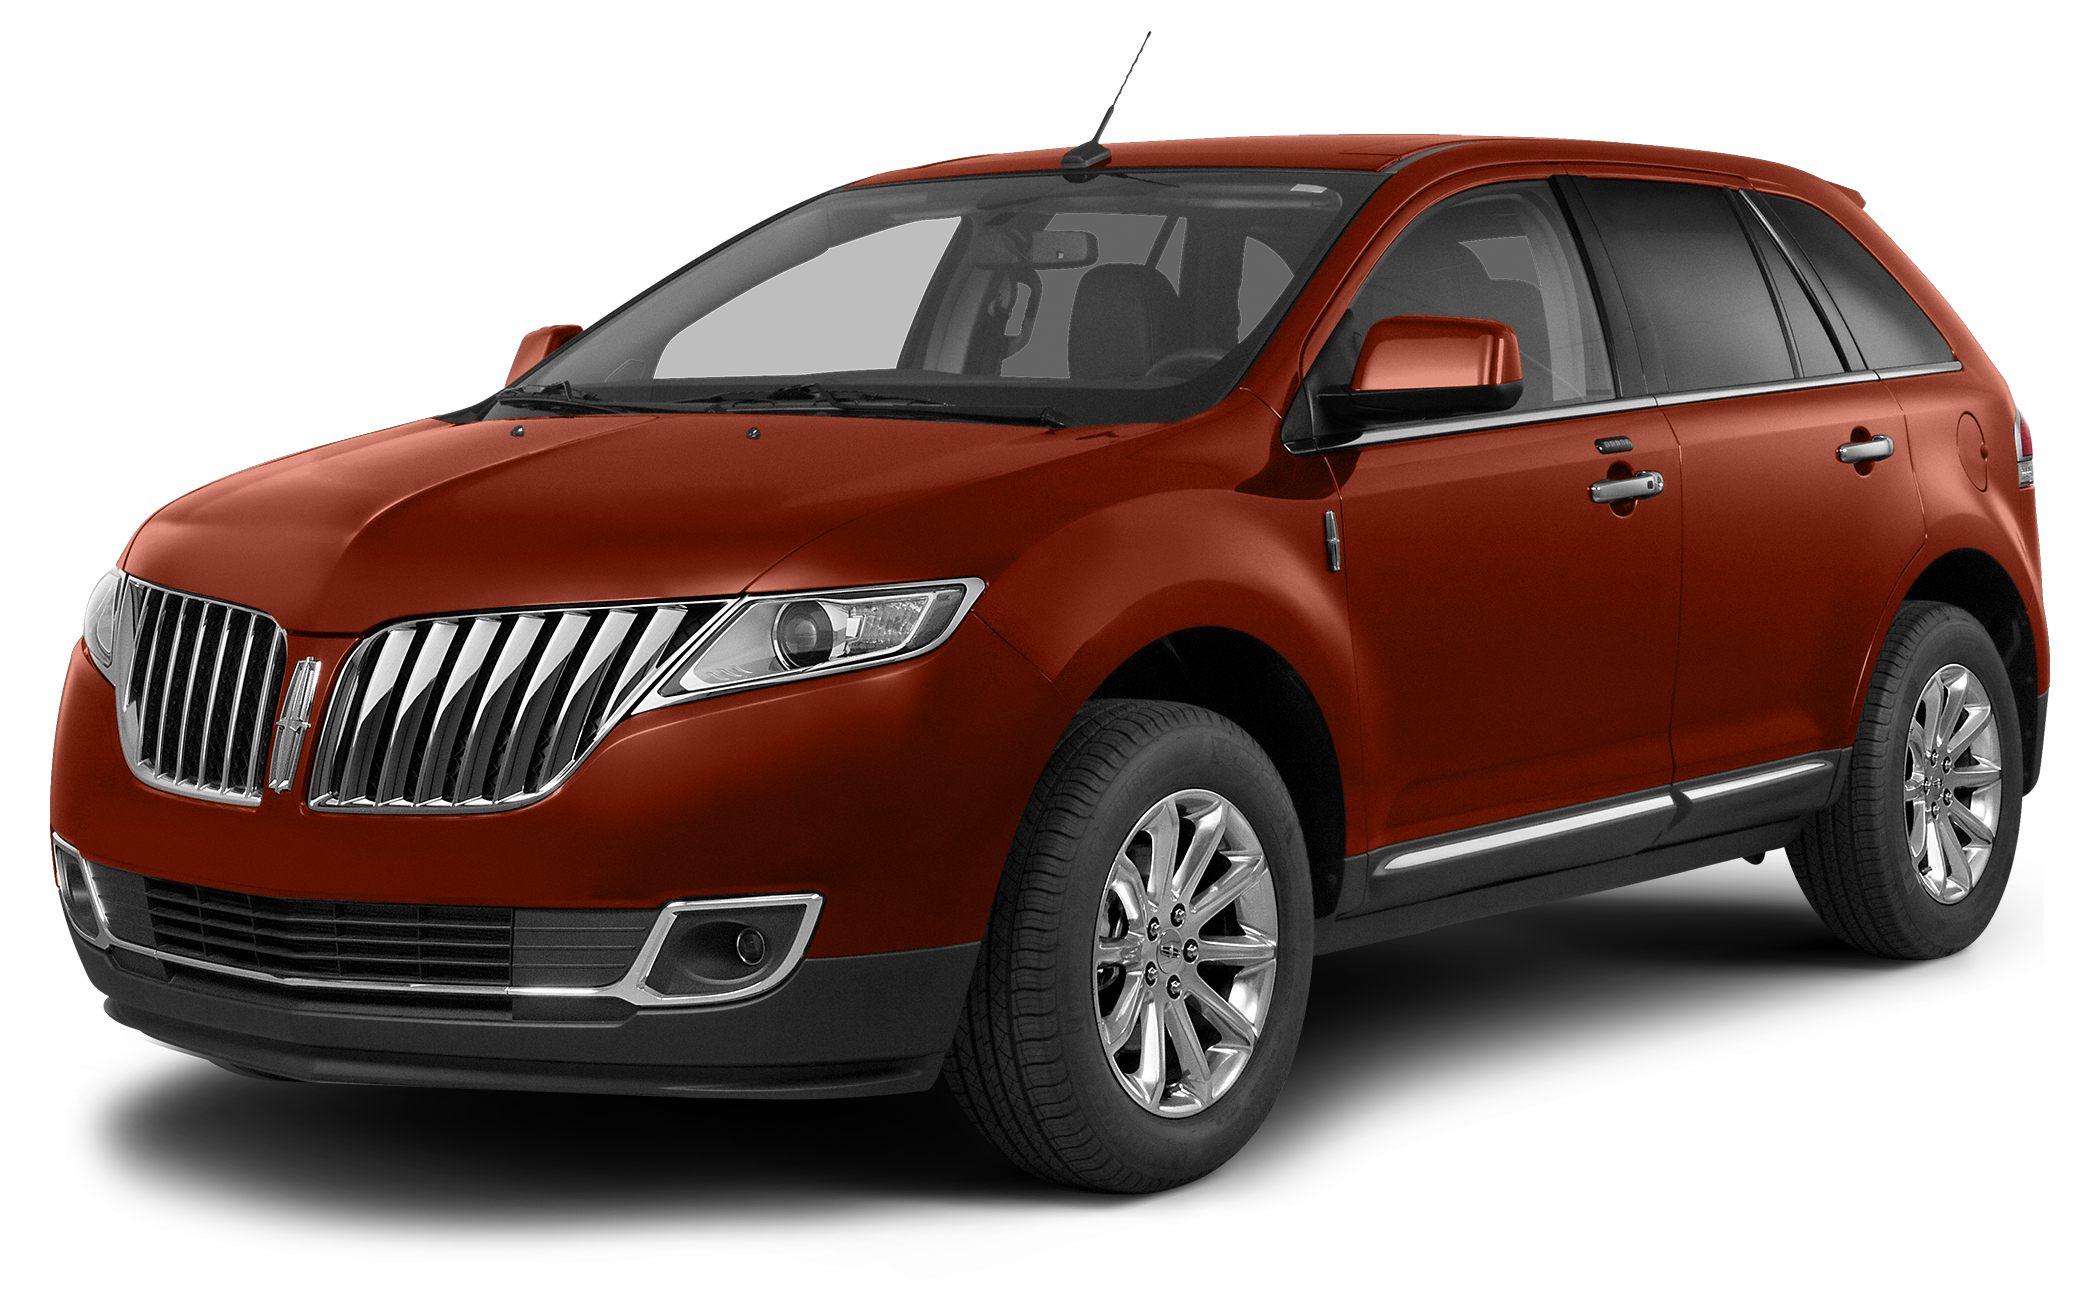 2014 Lincoln MKX Sunset Metallic